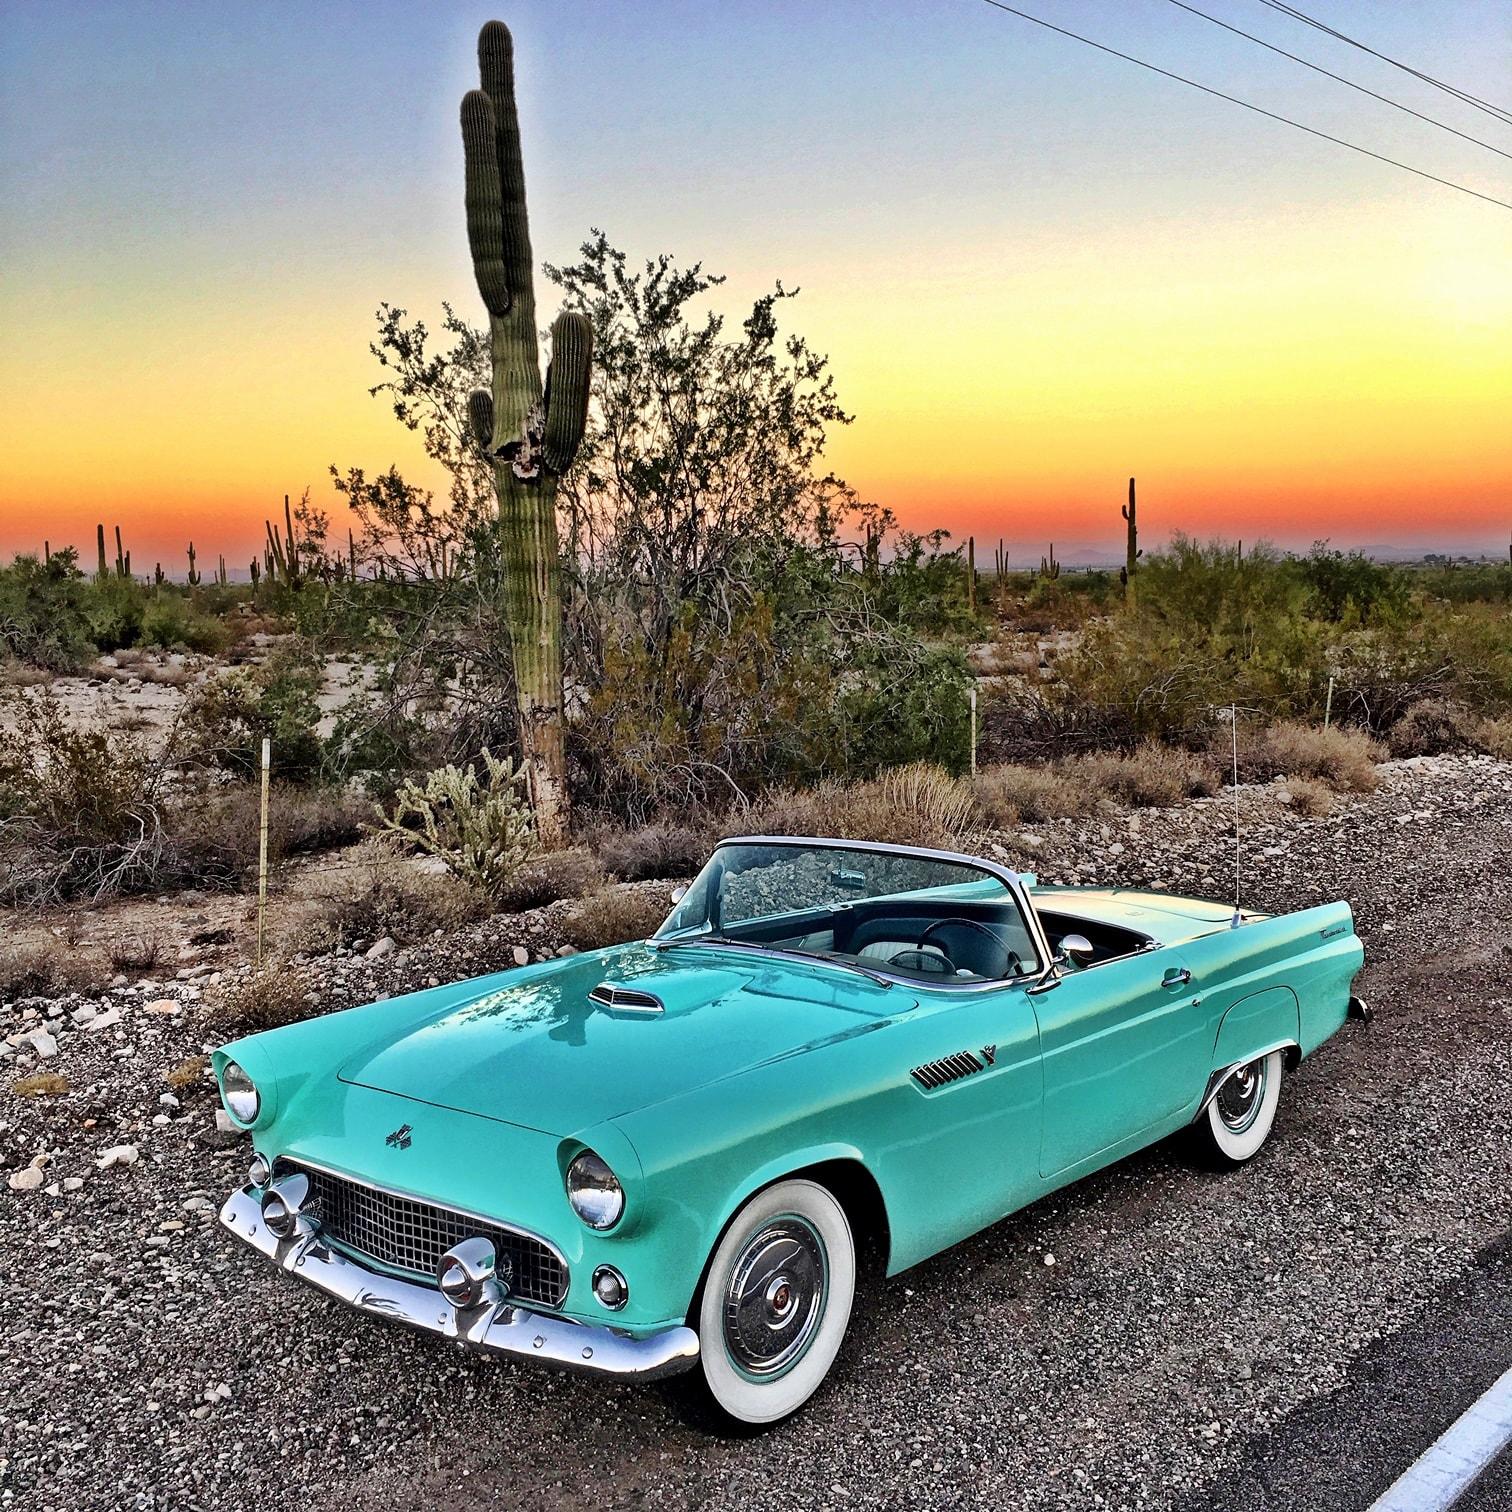 Janine Badoino - 1955 Ford Thunderbird -  Surprise, AZ